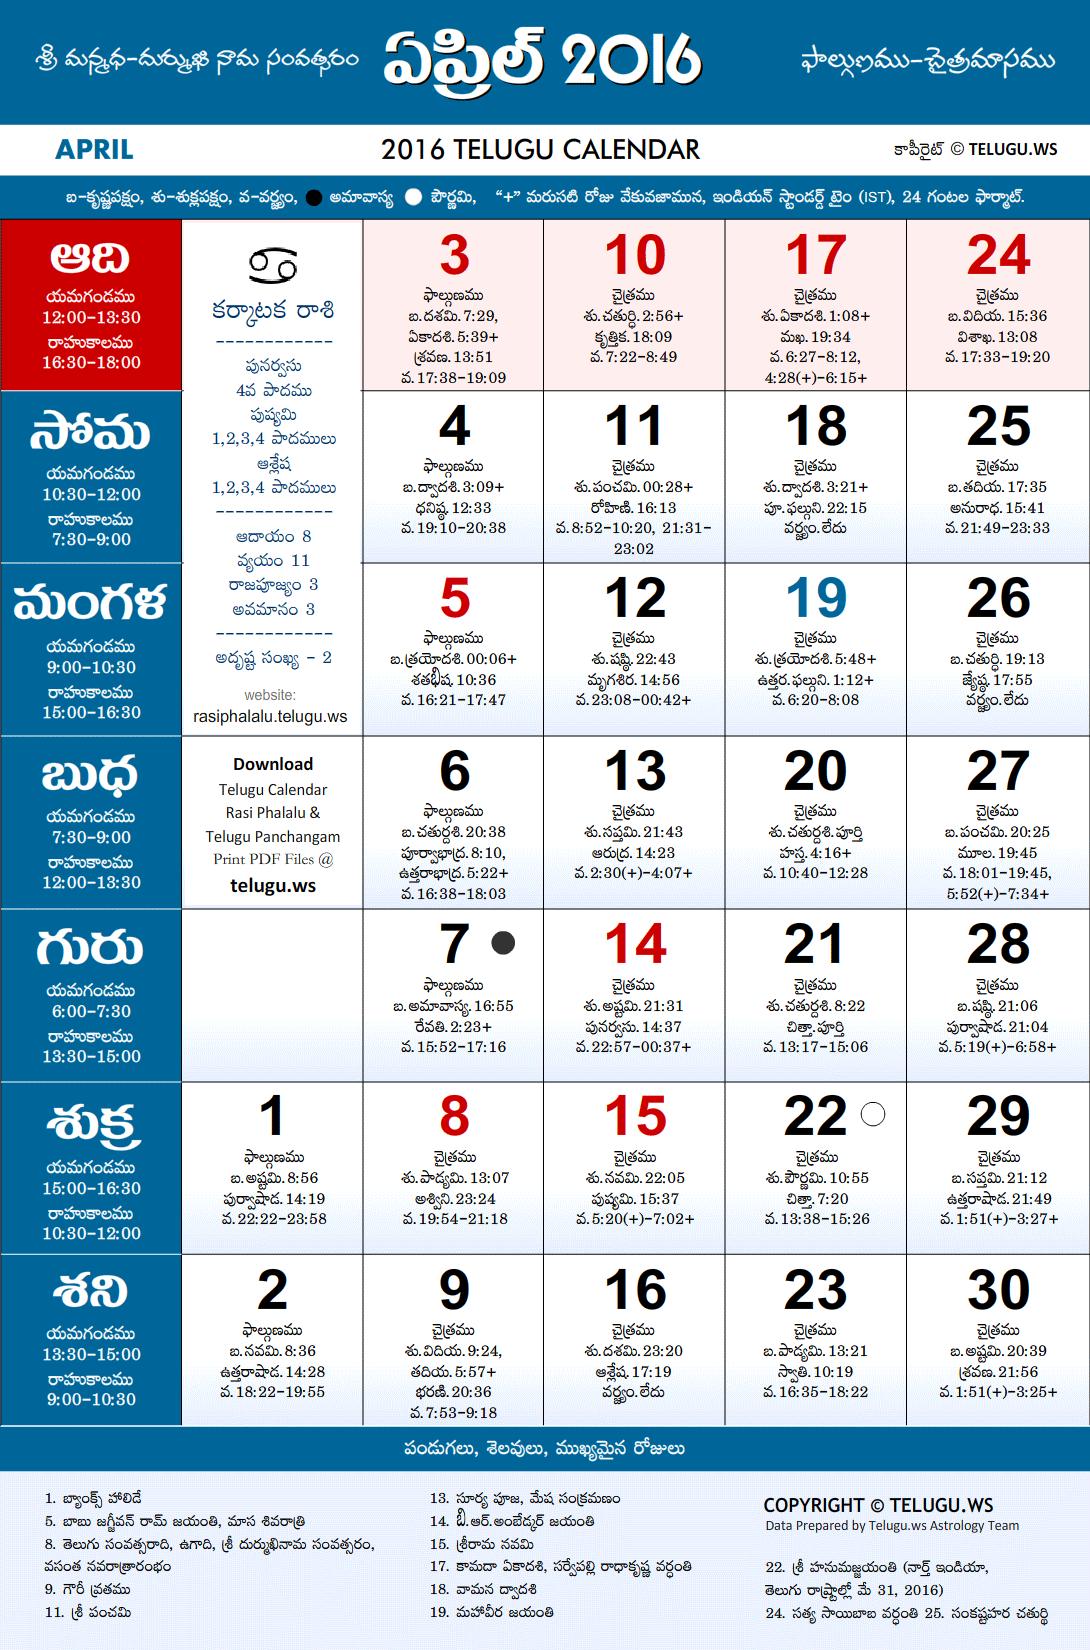 Telugu Calendar 2016 April Festivals, Holidays & Important Dates List